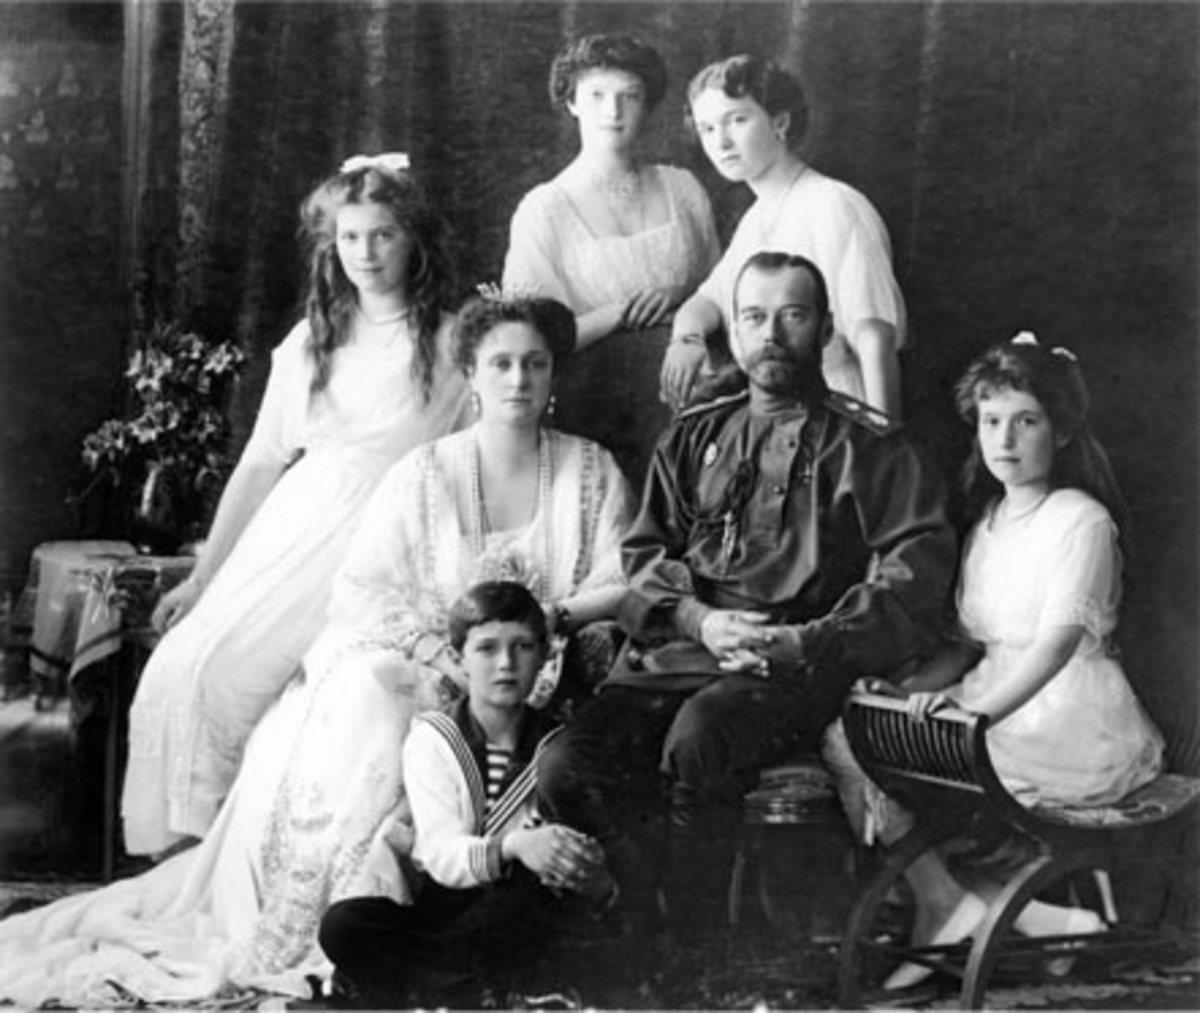 The last Russian Imperial Family.  Left to right standing:  Grand Duchess Tatiana, Grand Duchess Olga.  Left to right sitting:  Grand Duchess Maria and Tsarina Alexandra, Tsarevitch Alexi, Tzar Nicholas II, Grand Duchess Anastasia.